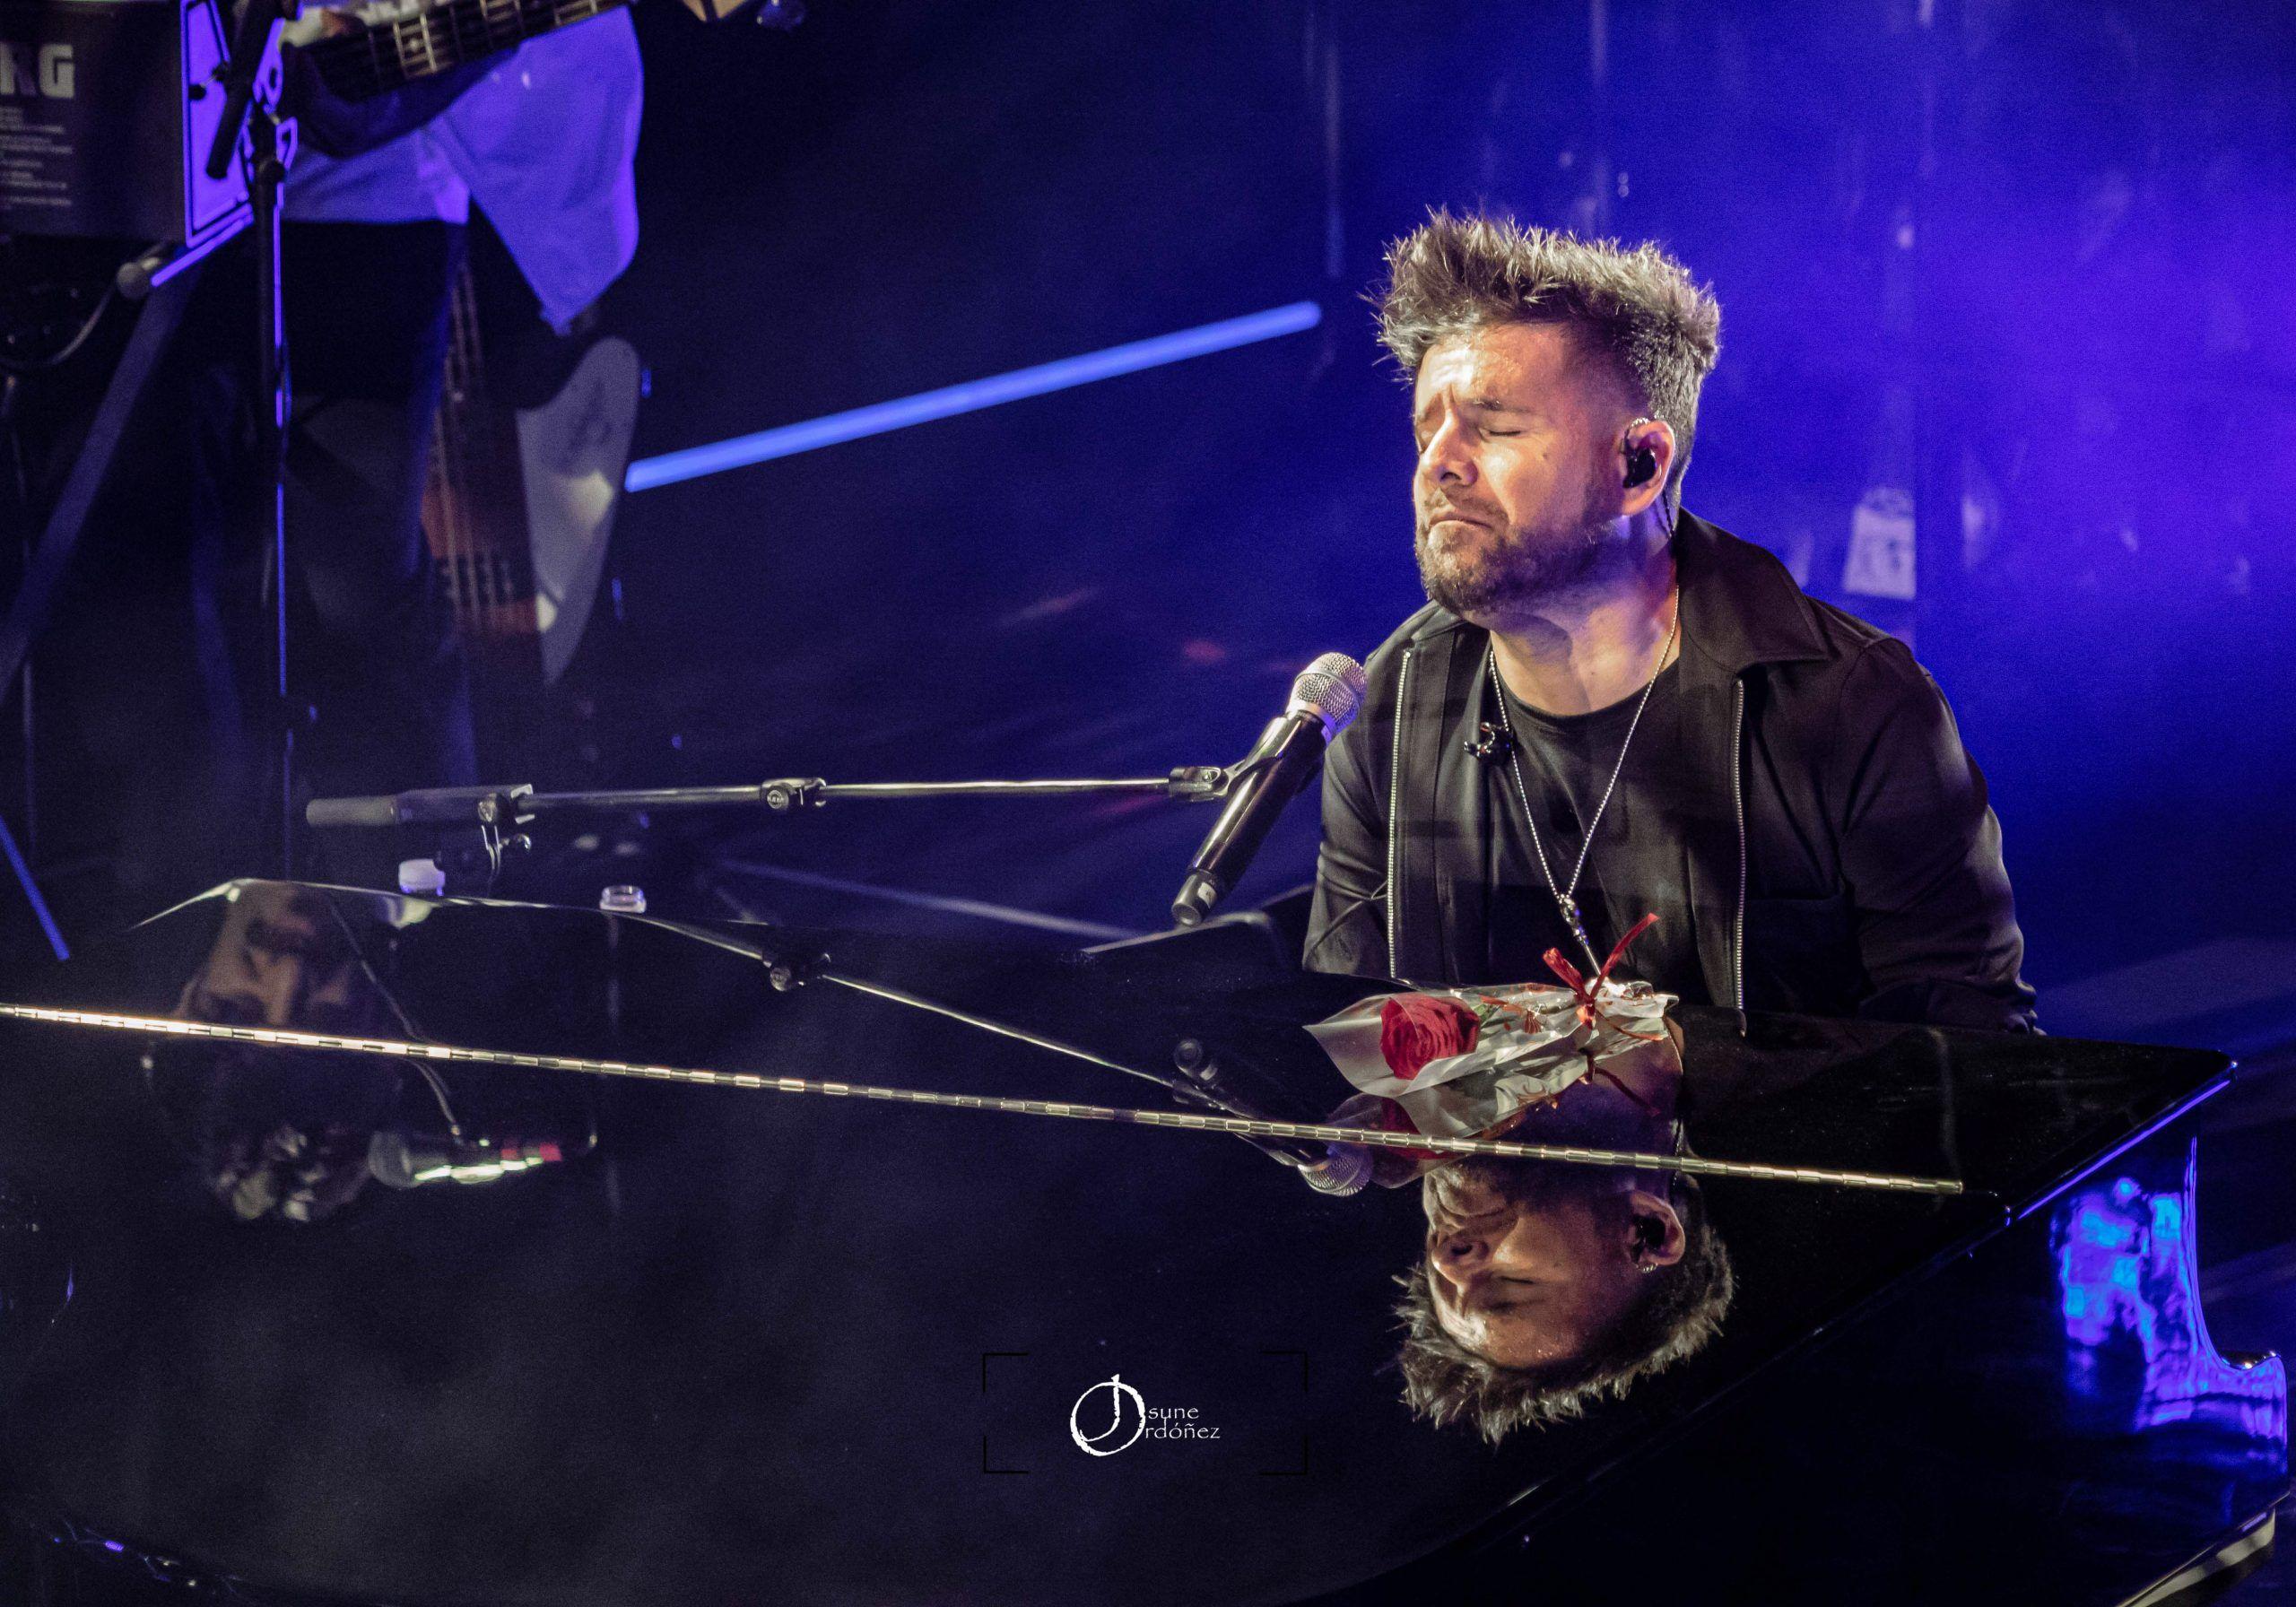 Pablo López presentación gira Mayday & Stay Tour en Madrid. Fo